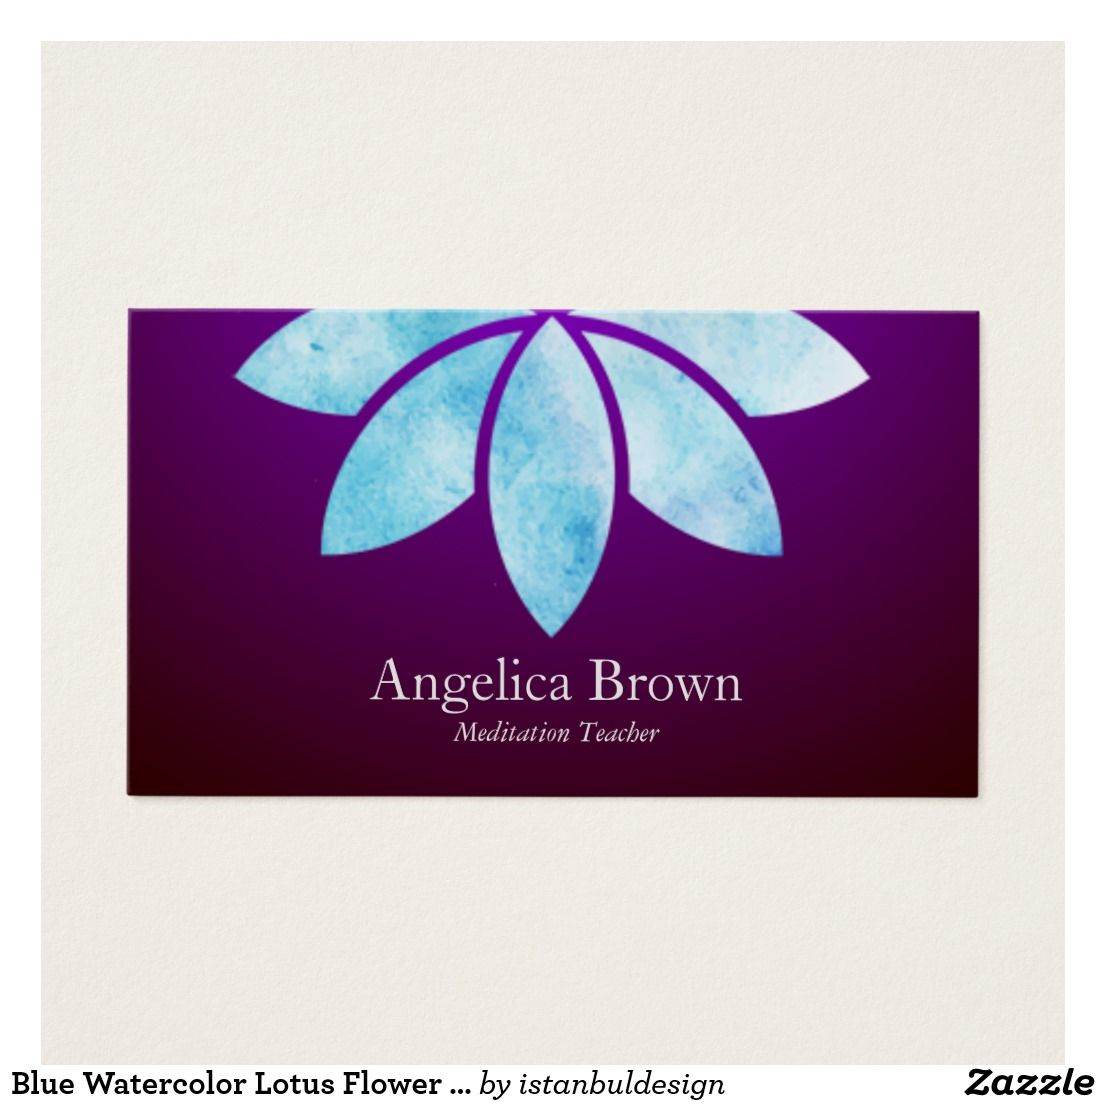 Blue Watercolor Lotus Flower Business Card | Meditation Business ...